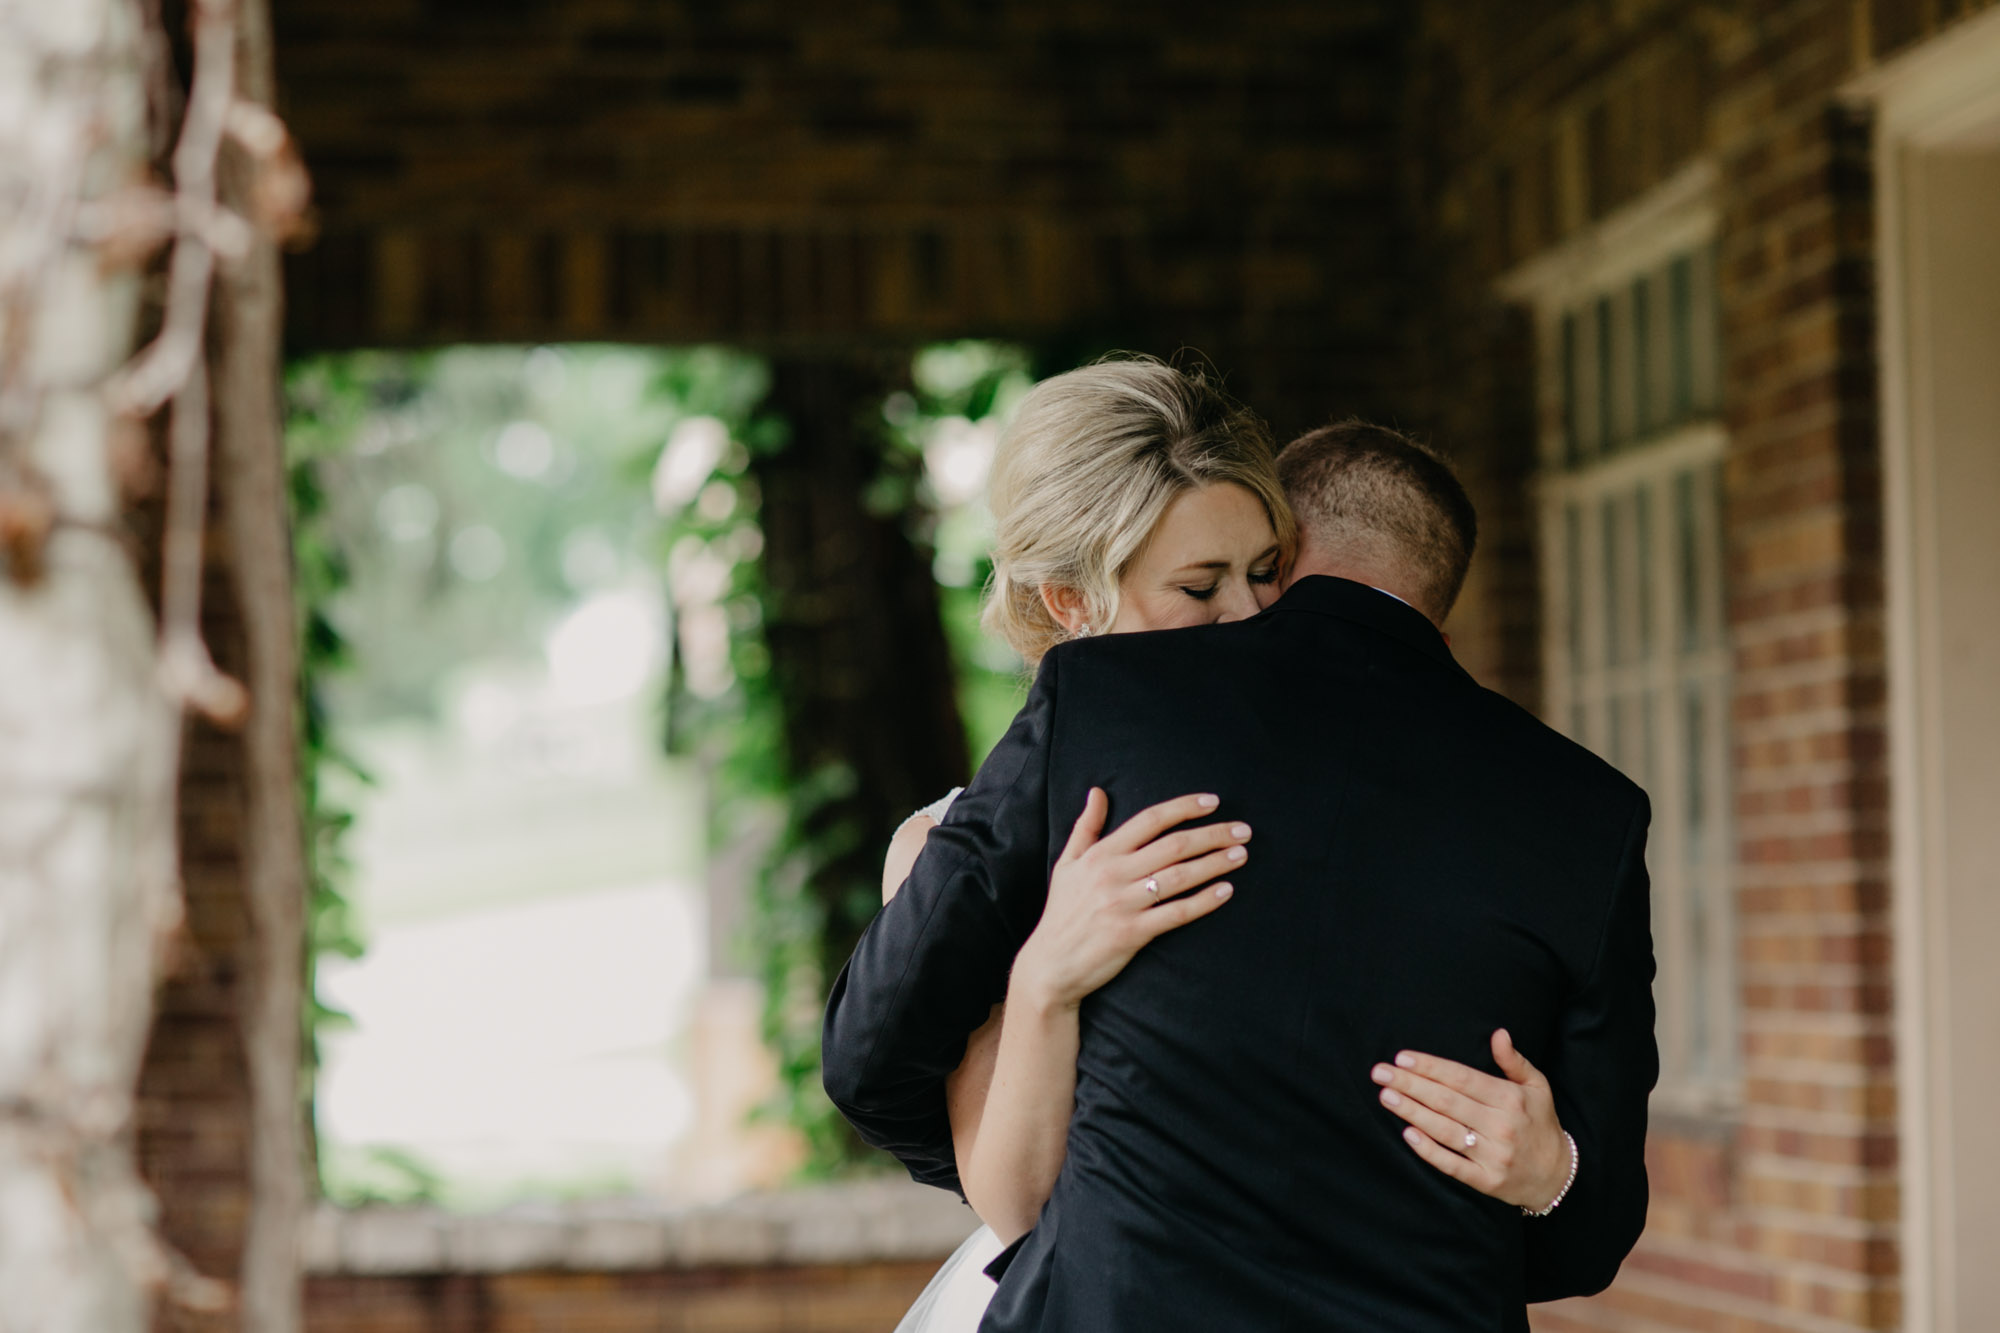 omaha-wedding-photographer-12.jpg